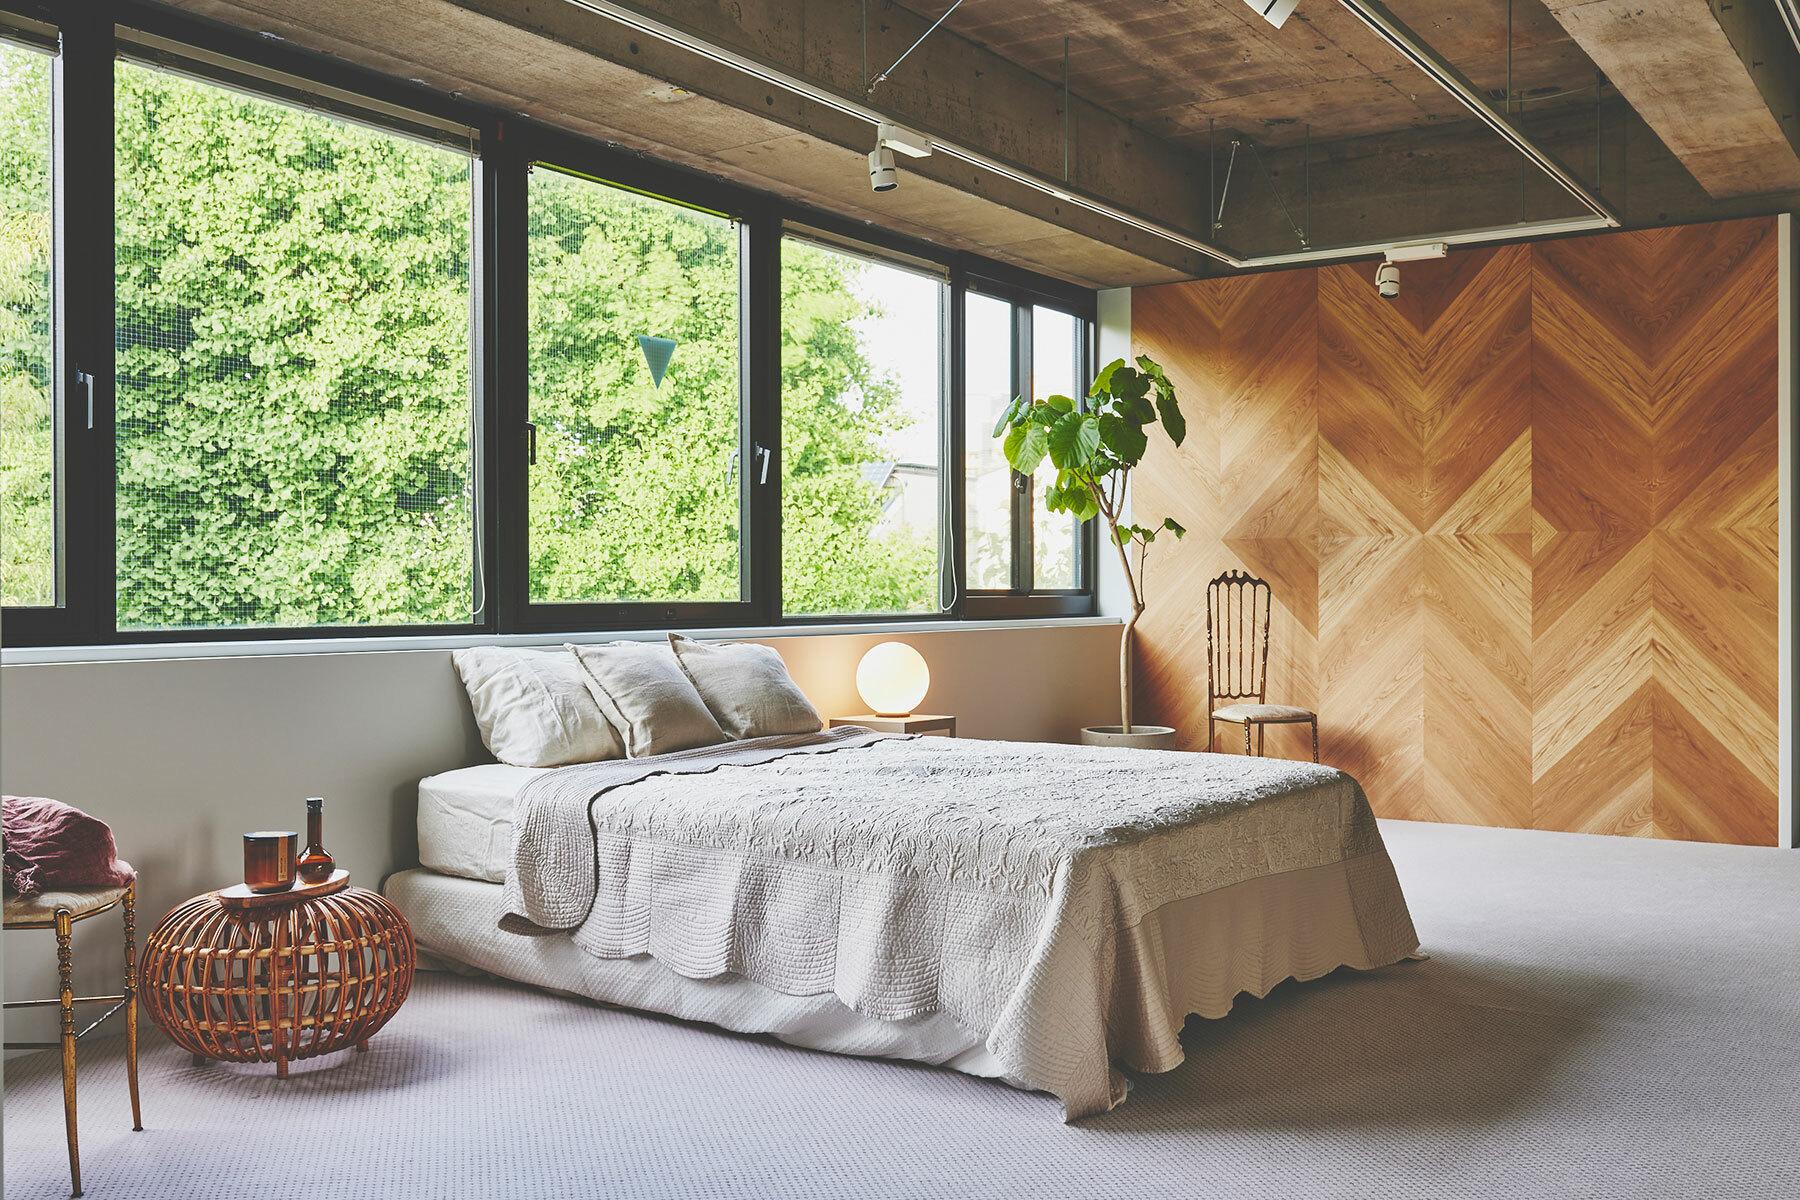 PORCH Shinagawa studio 3F(ポーチ シナガワスタジオ)3F_Bedroom